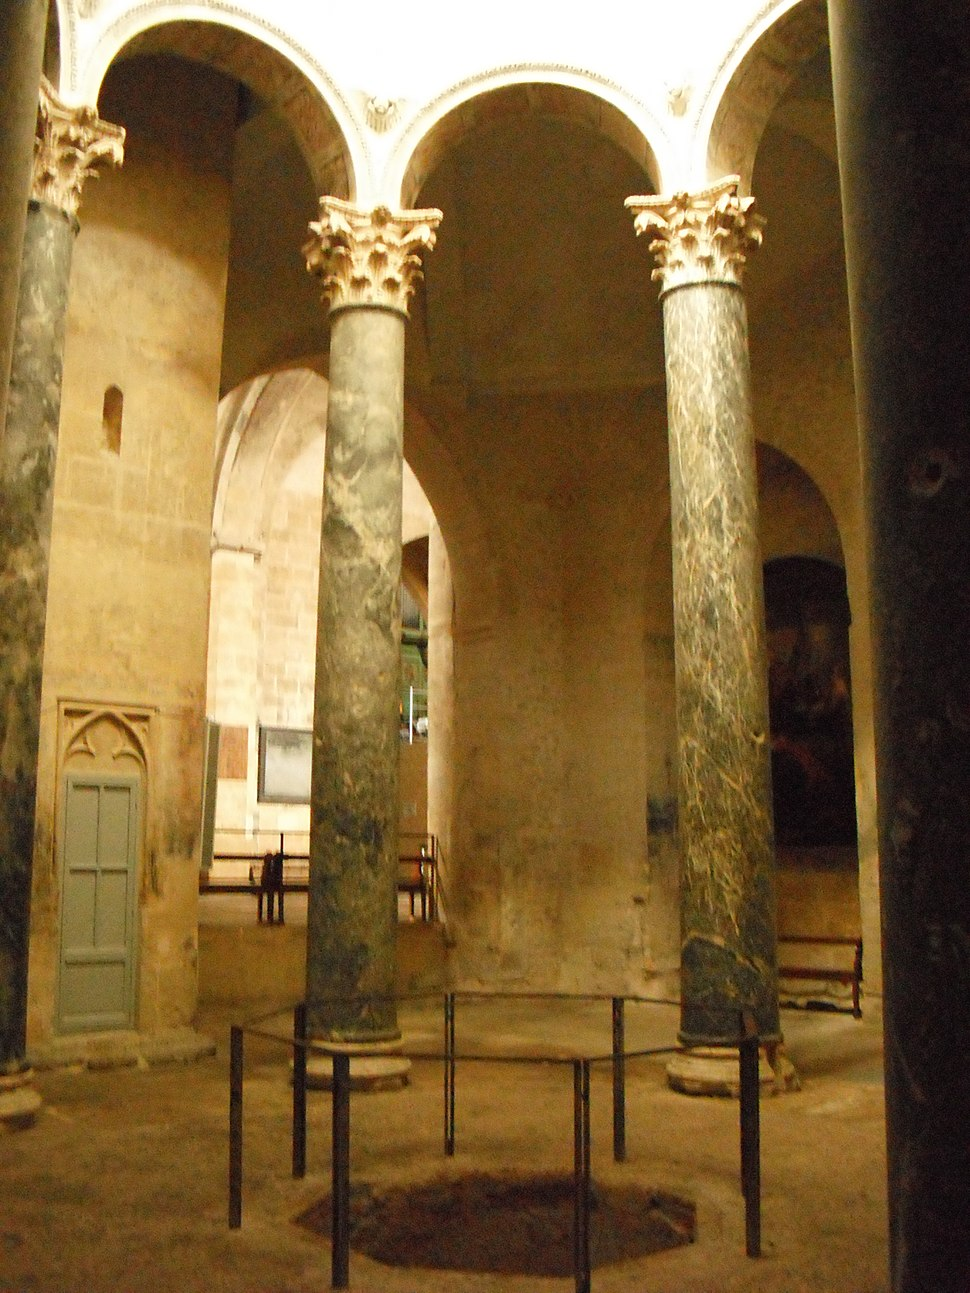 Baptistere Saint Sauveur by Malost